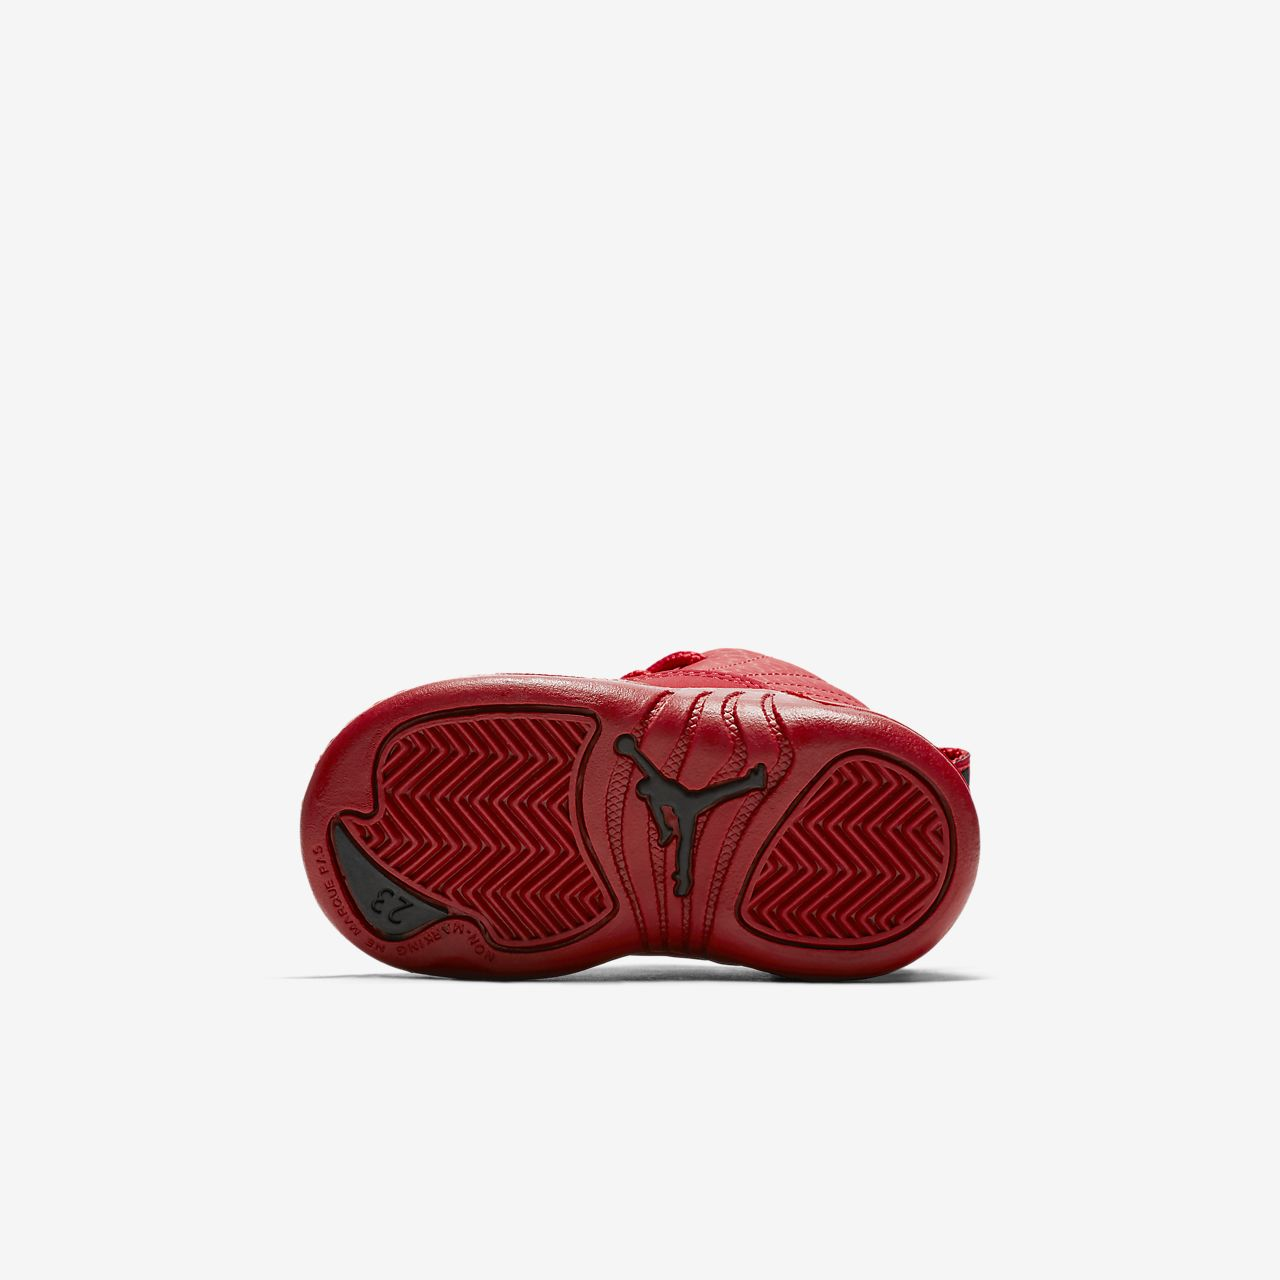 new style 2a63f 60eae Air Jordan Retro 12 Baby & Toddler Shoe (1.5-9.5)